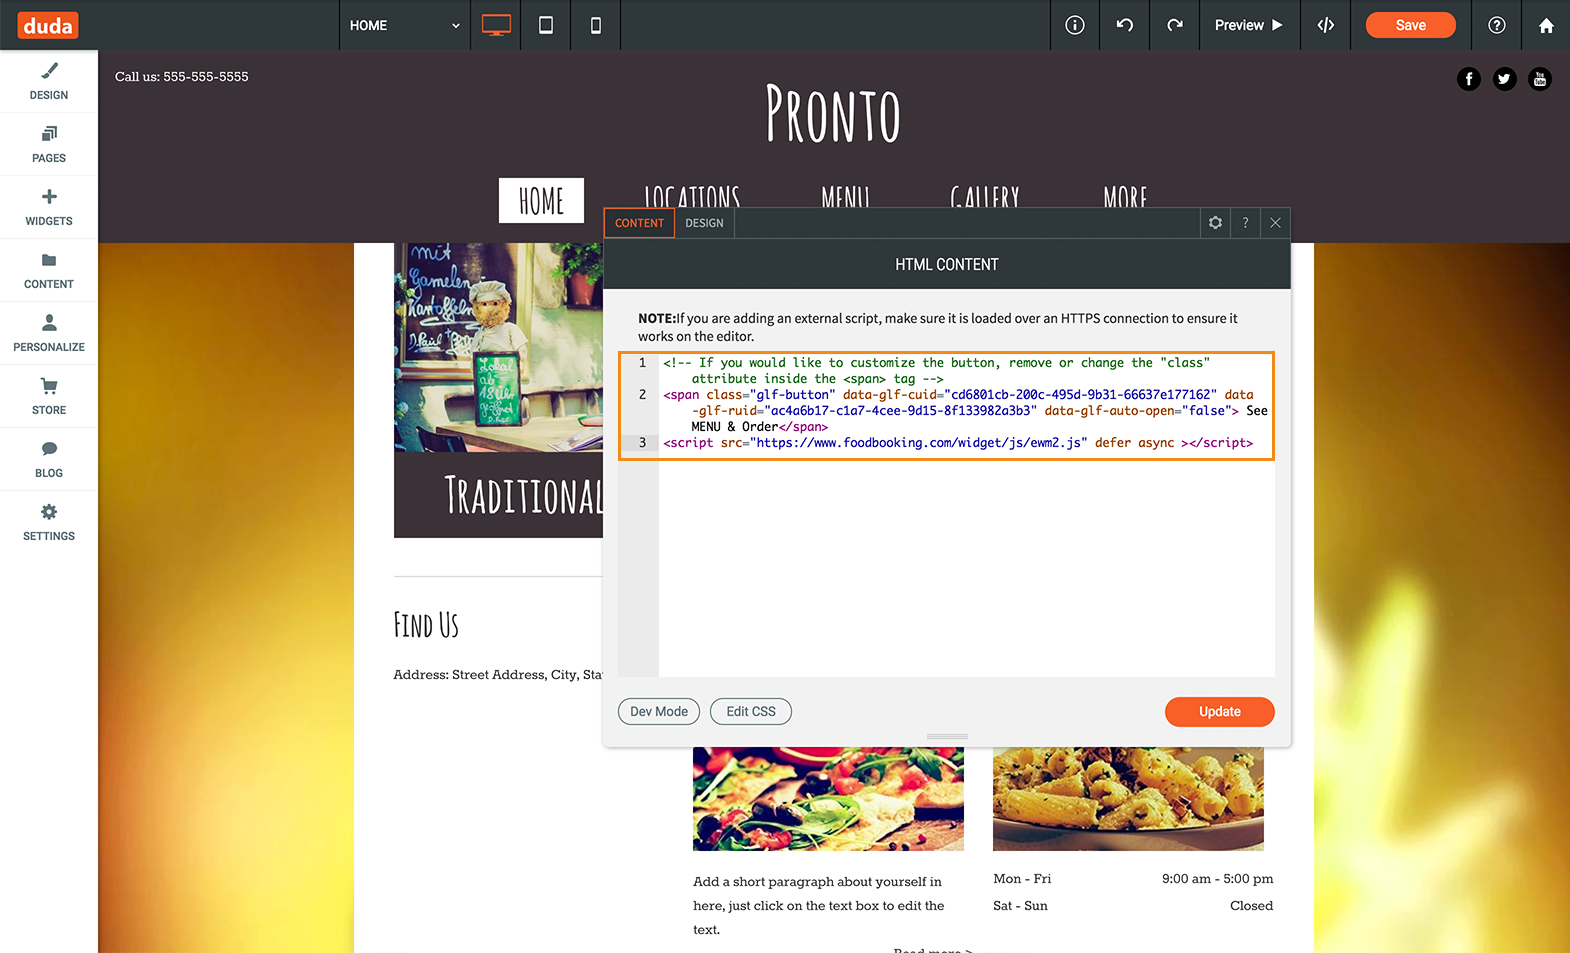 duda website builder - copy paste the online ordering button code